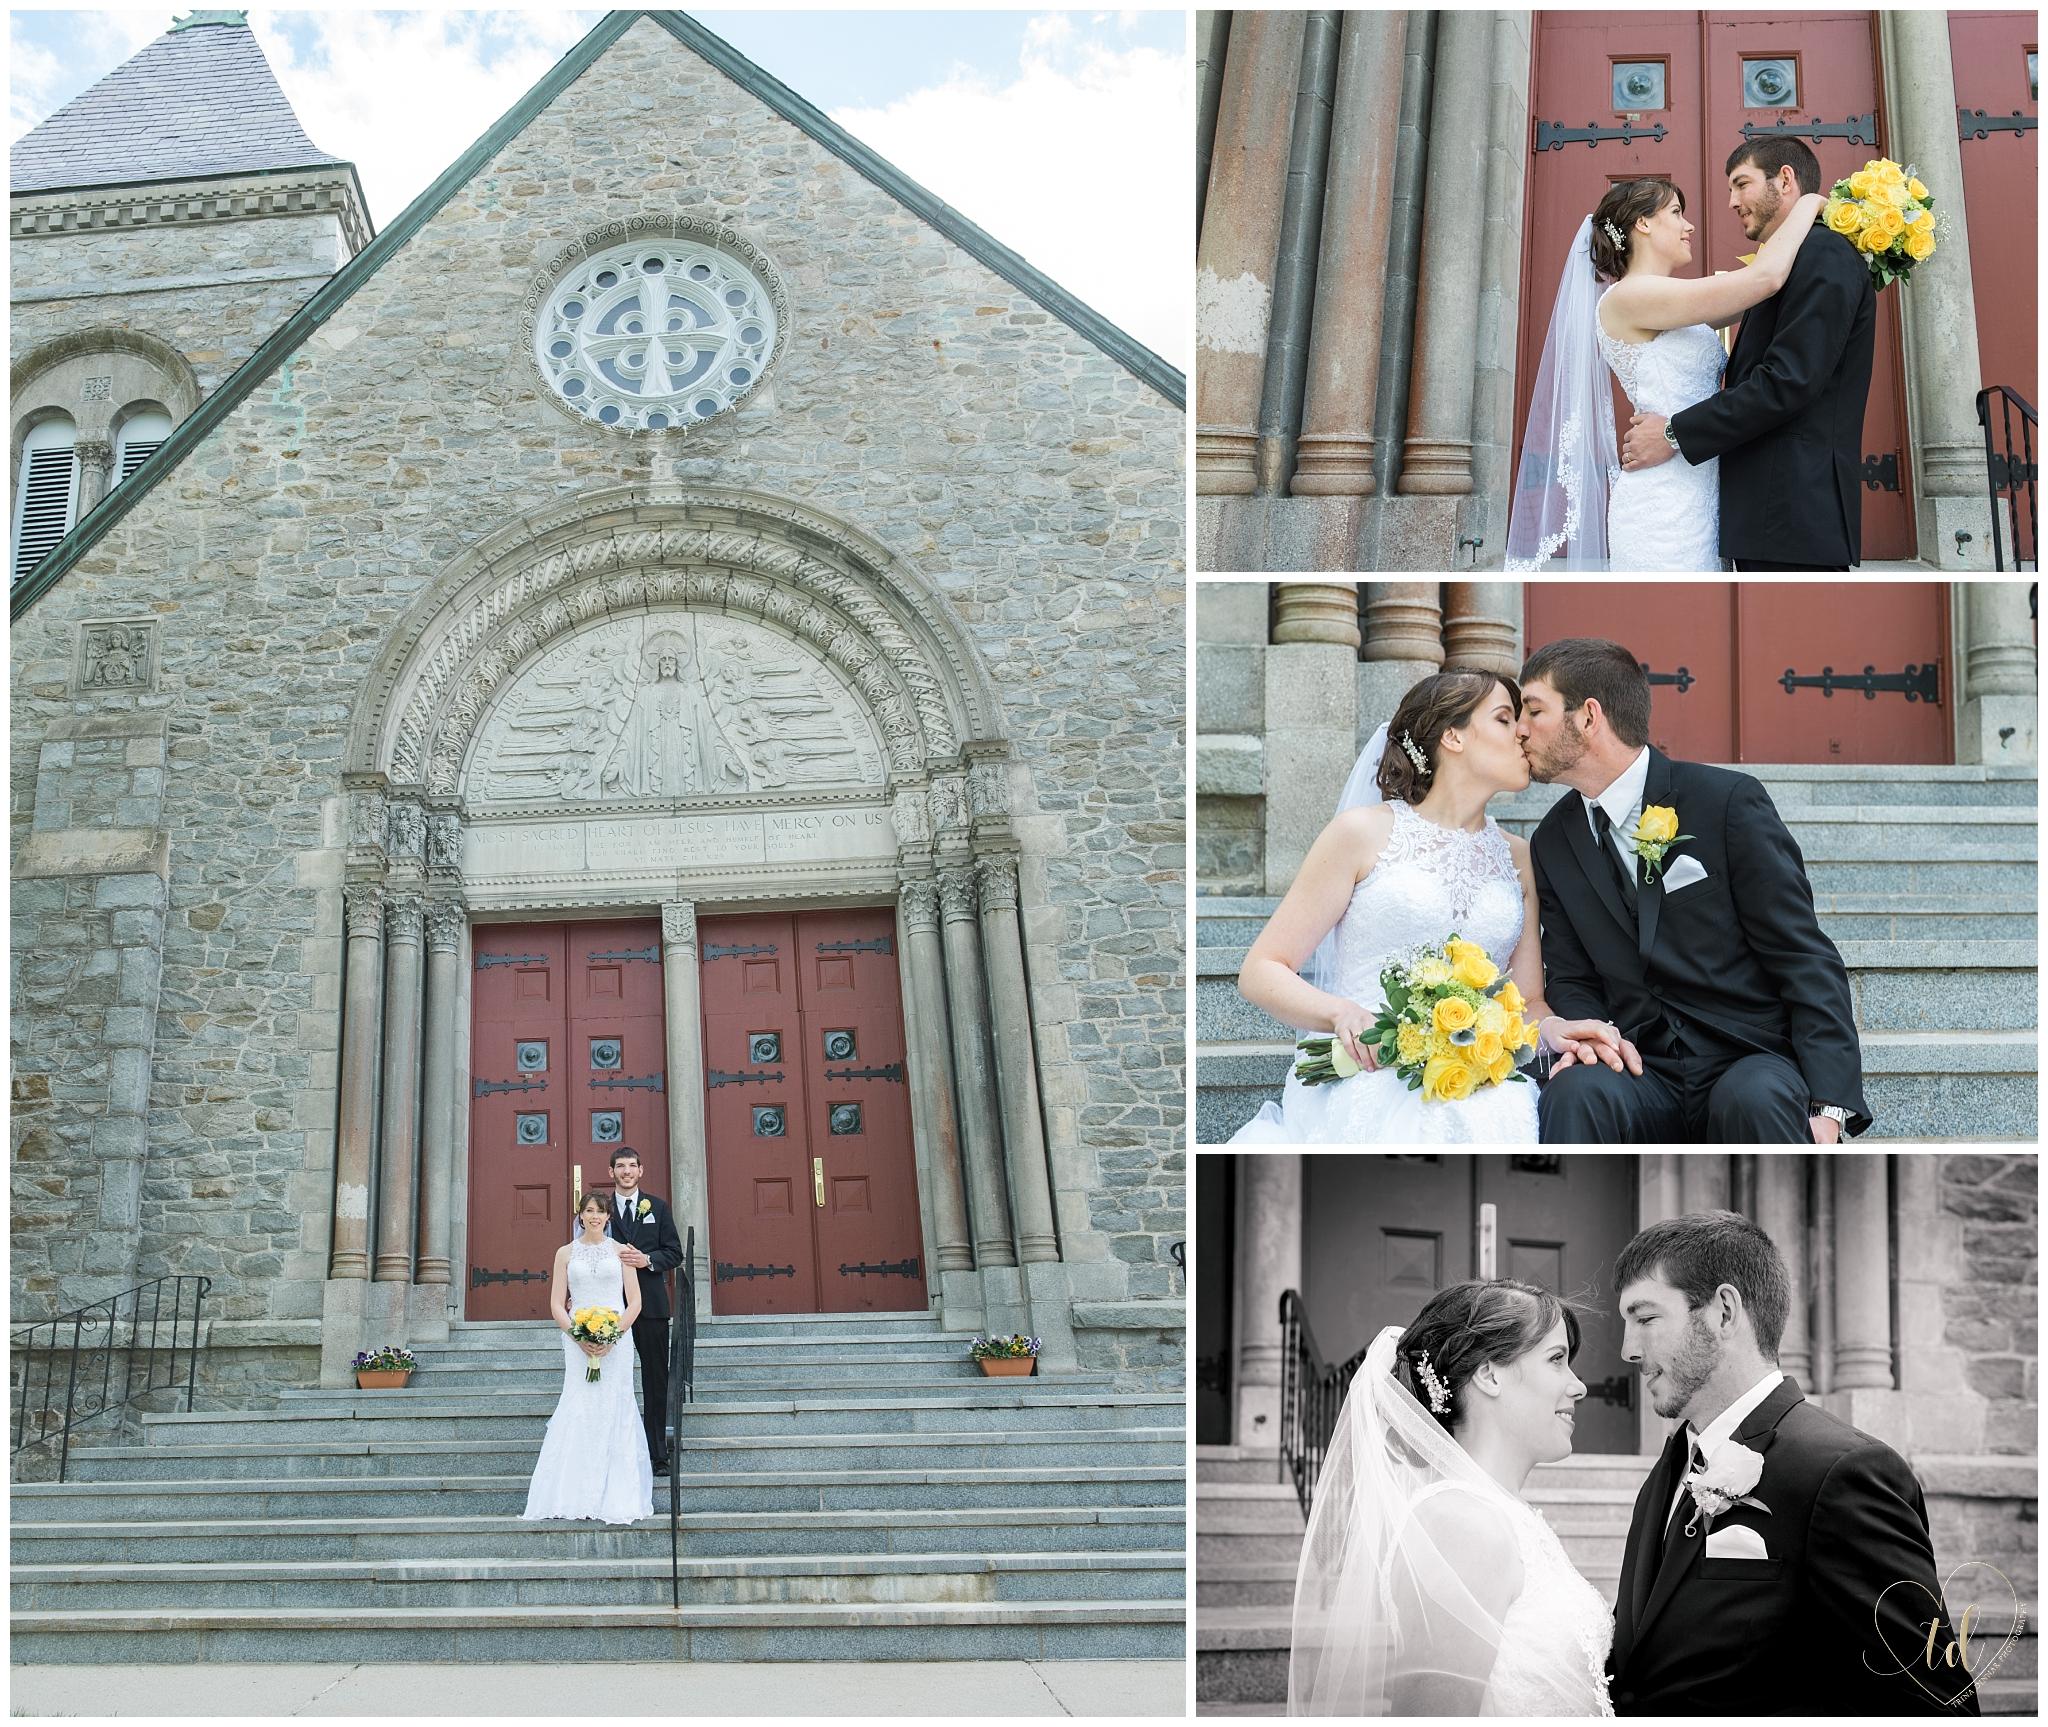 A Yarmouth Maine Wedding Photographed by Trina Dinnar.